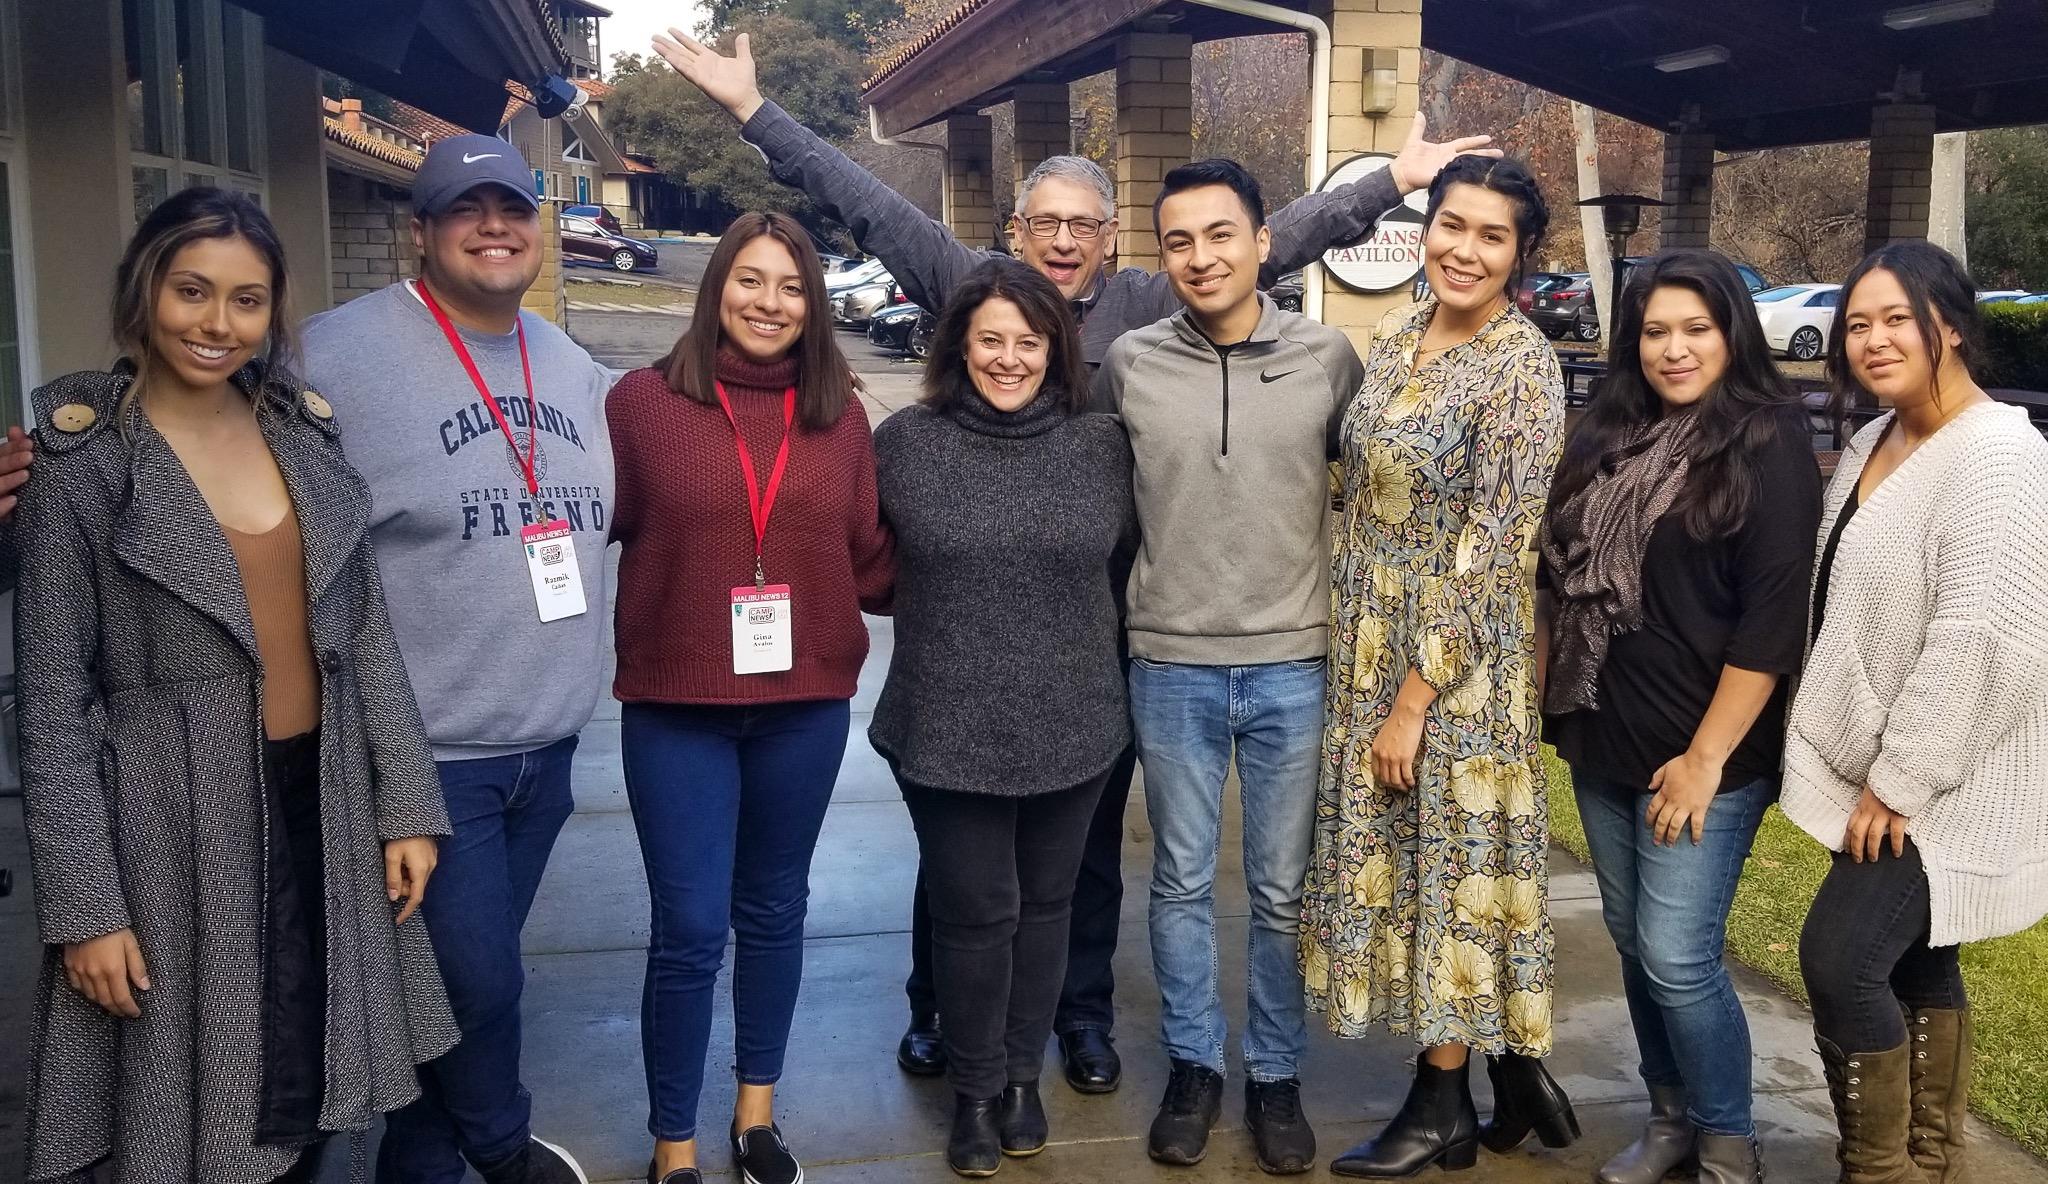 Chelsea Chavira, Razmik Cañas, Gina Avalos, Faith Sidlow, Hal Eisner [Fox 11 LA reporter] (Behind Faith), Tony Salazar, Ishshah Padilla, Tori Lavon Custodio, Alodie Resendiz